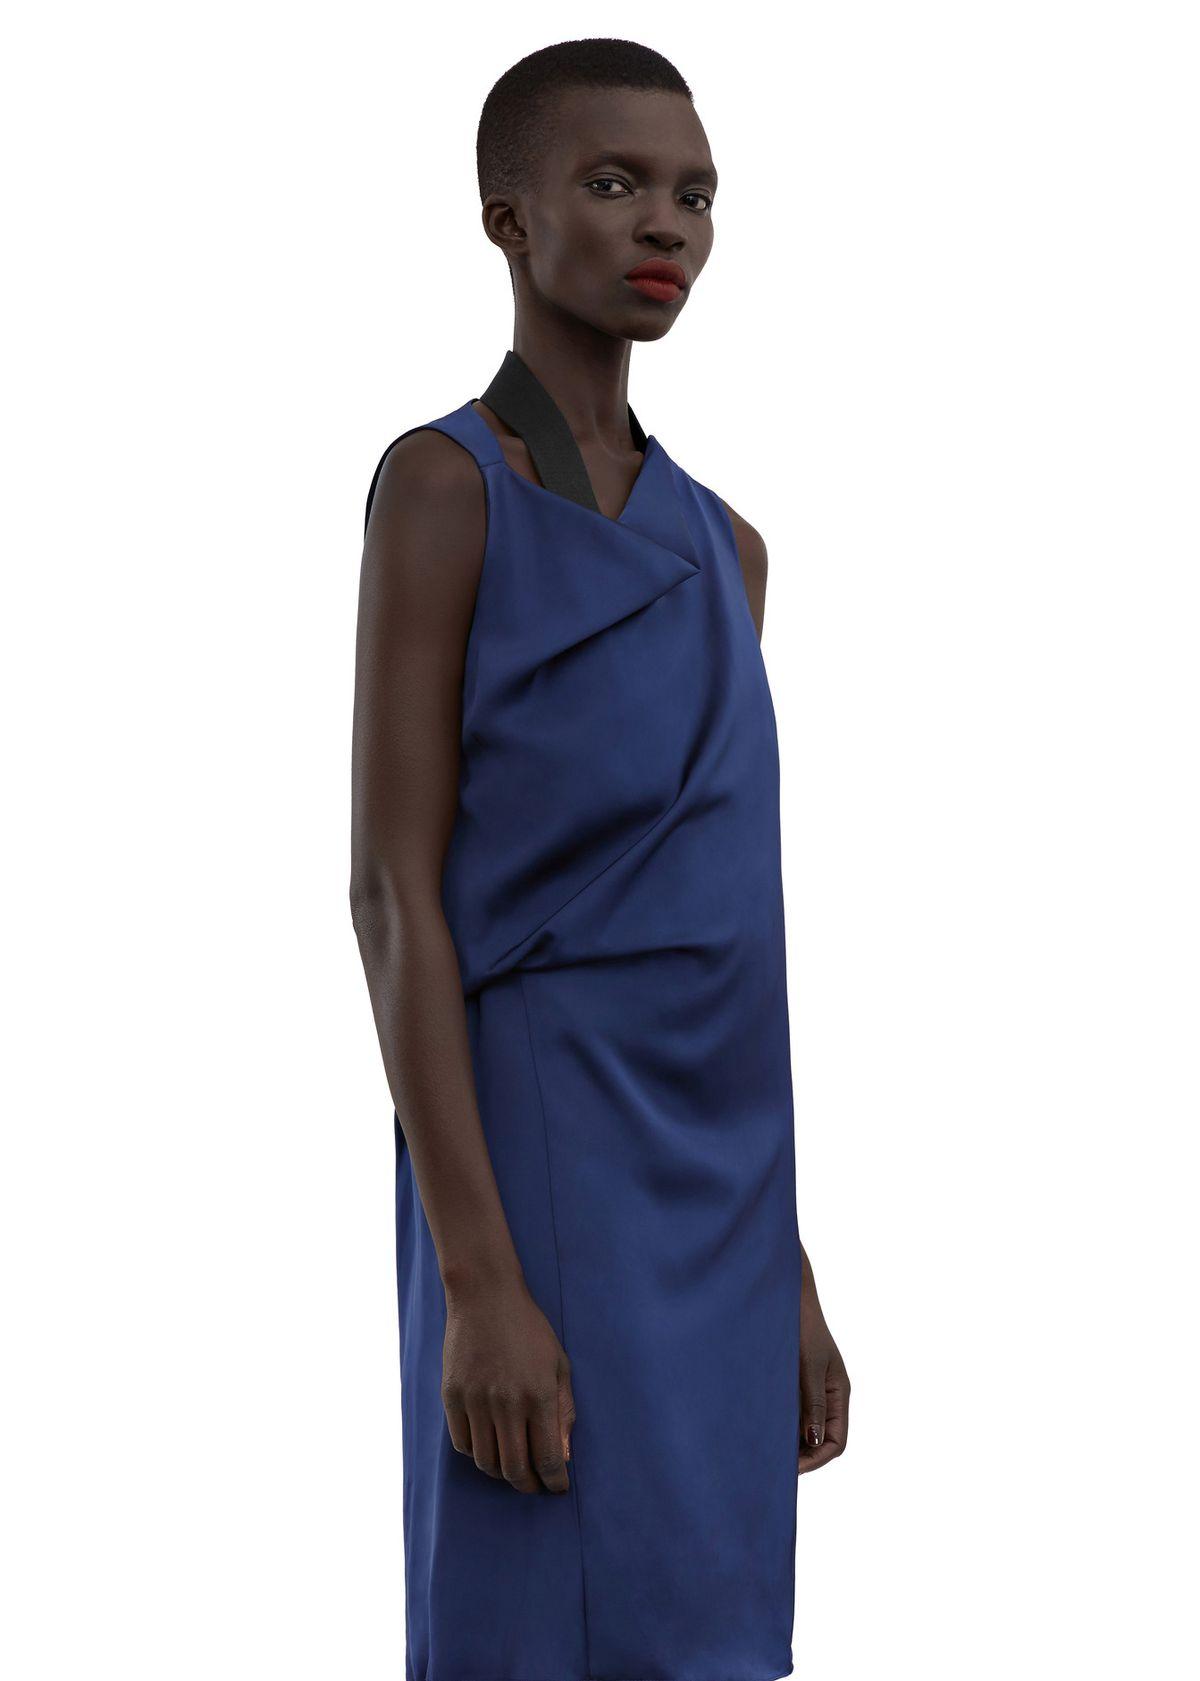 A blue satin dress